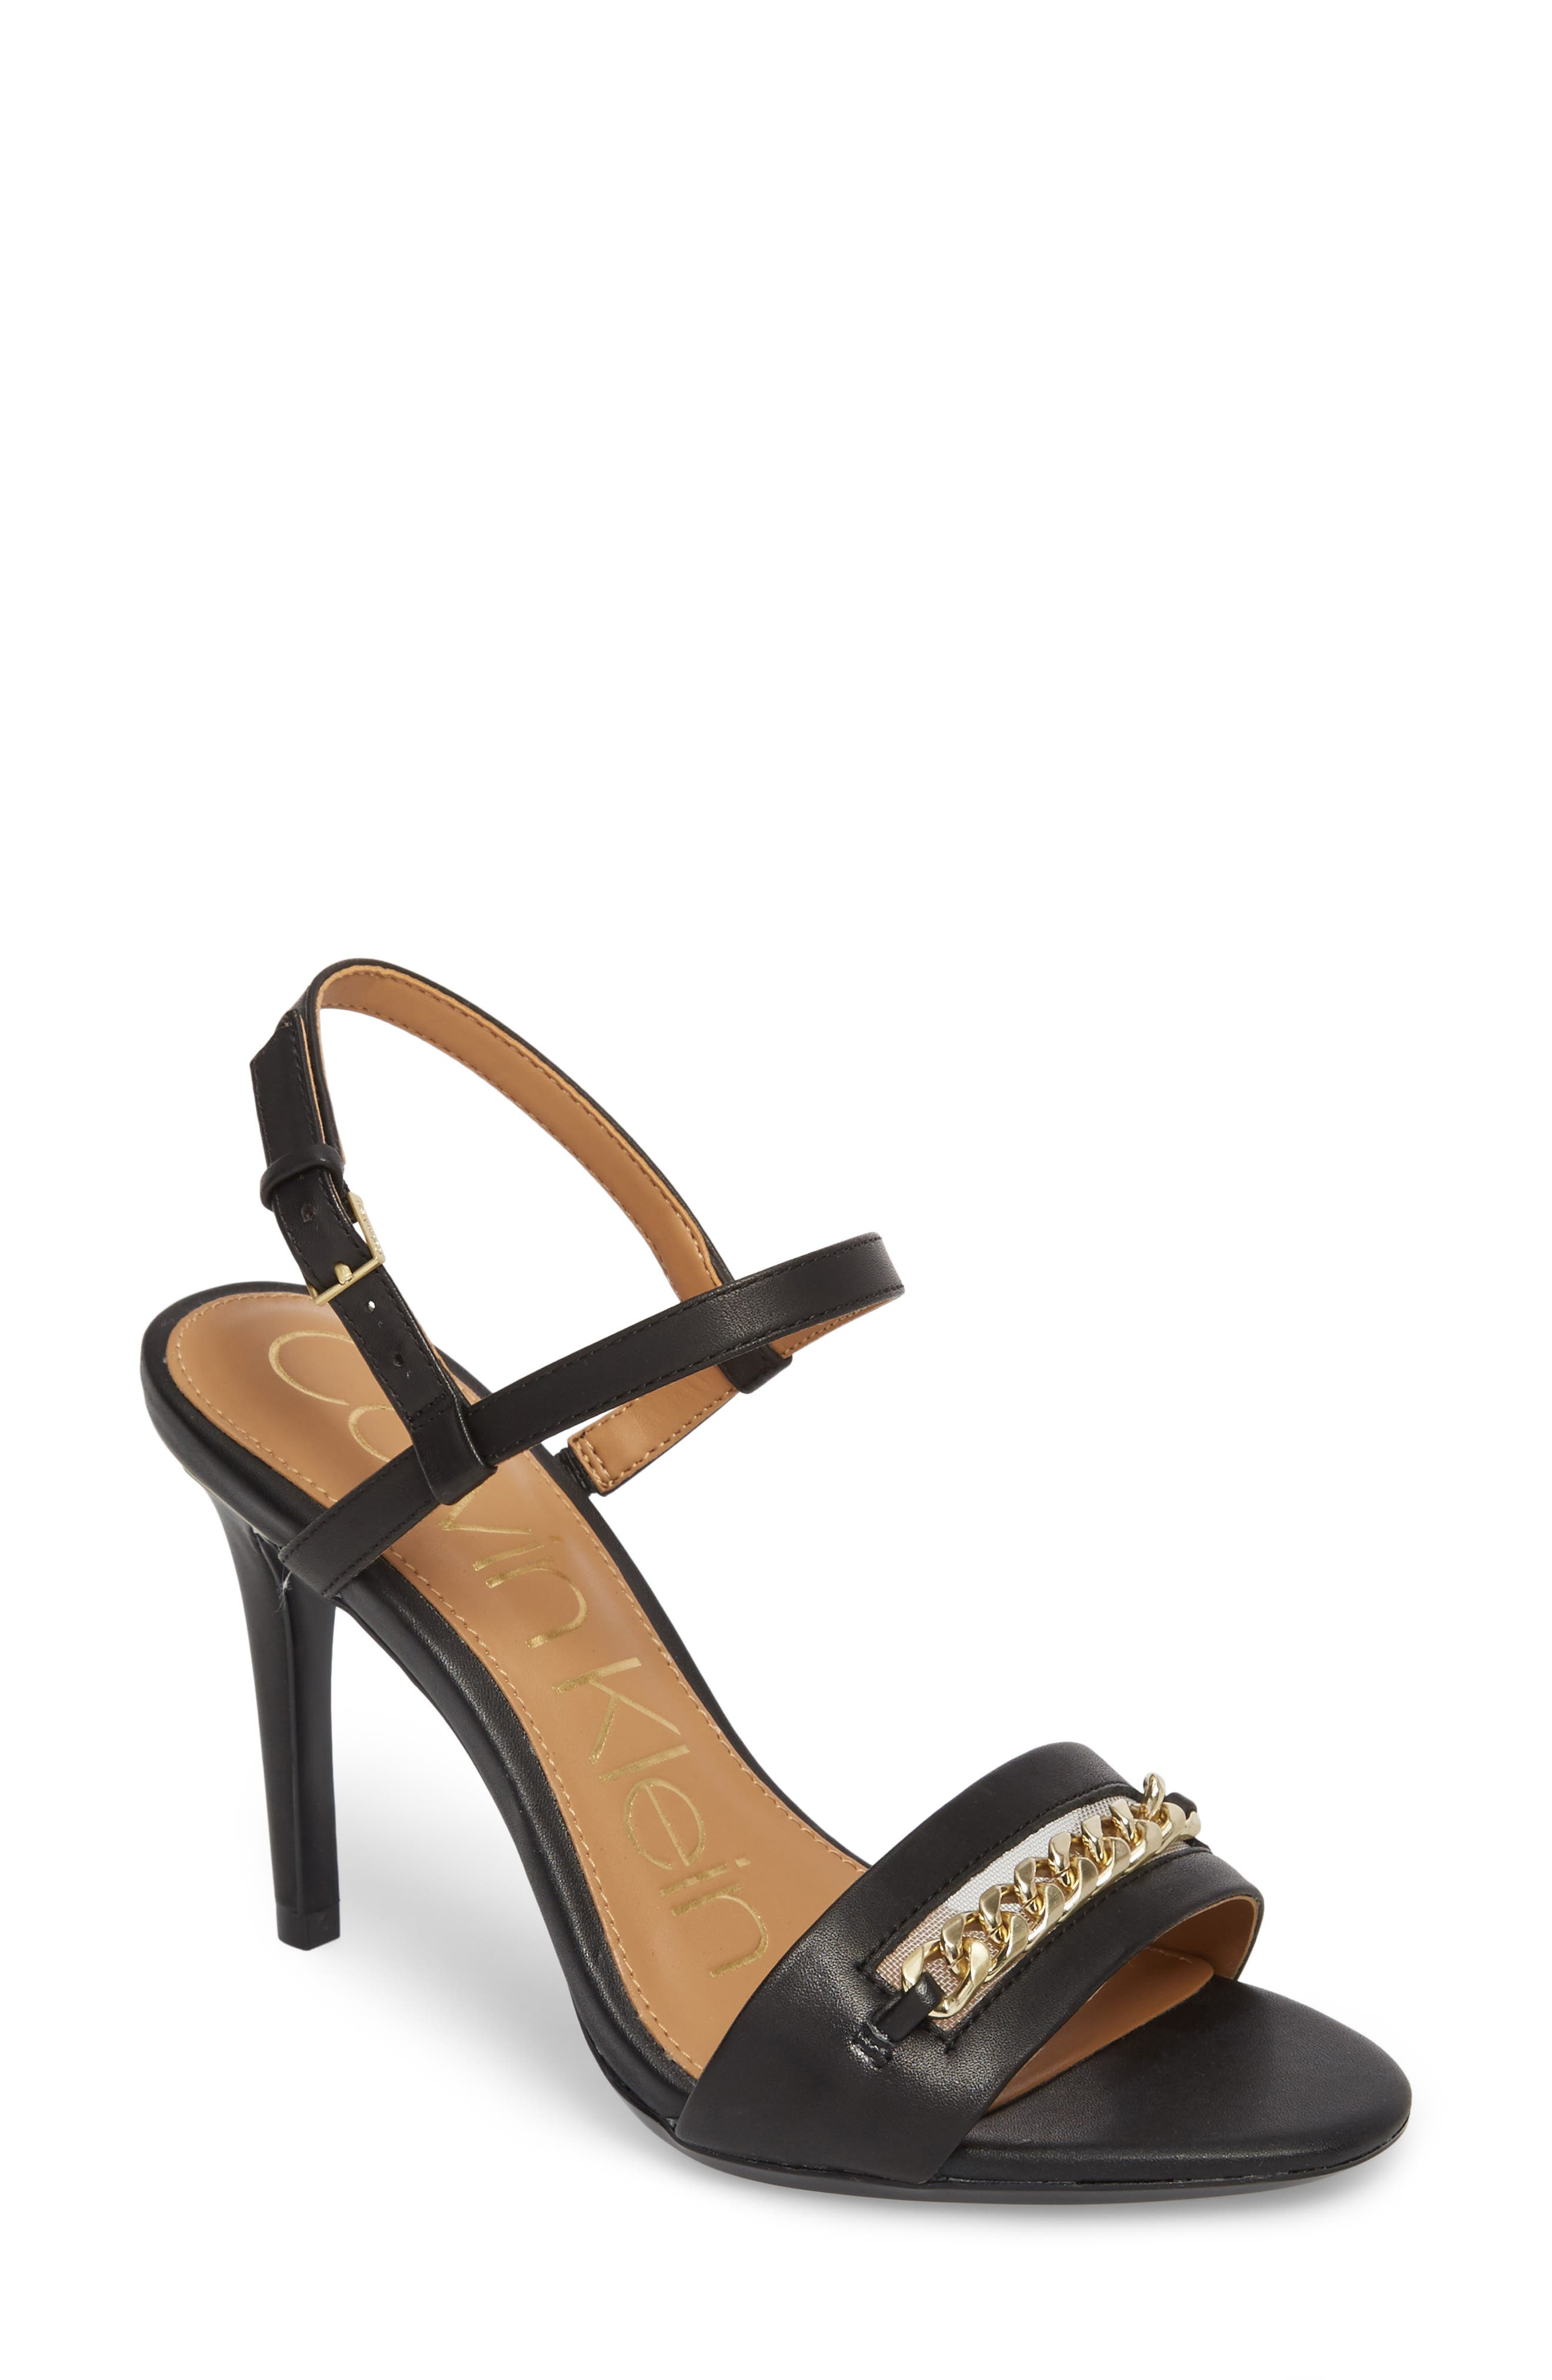 Nori Sandal,                         Main,                         color, Black Leather